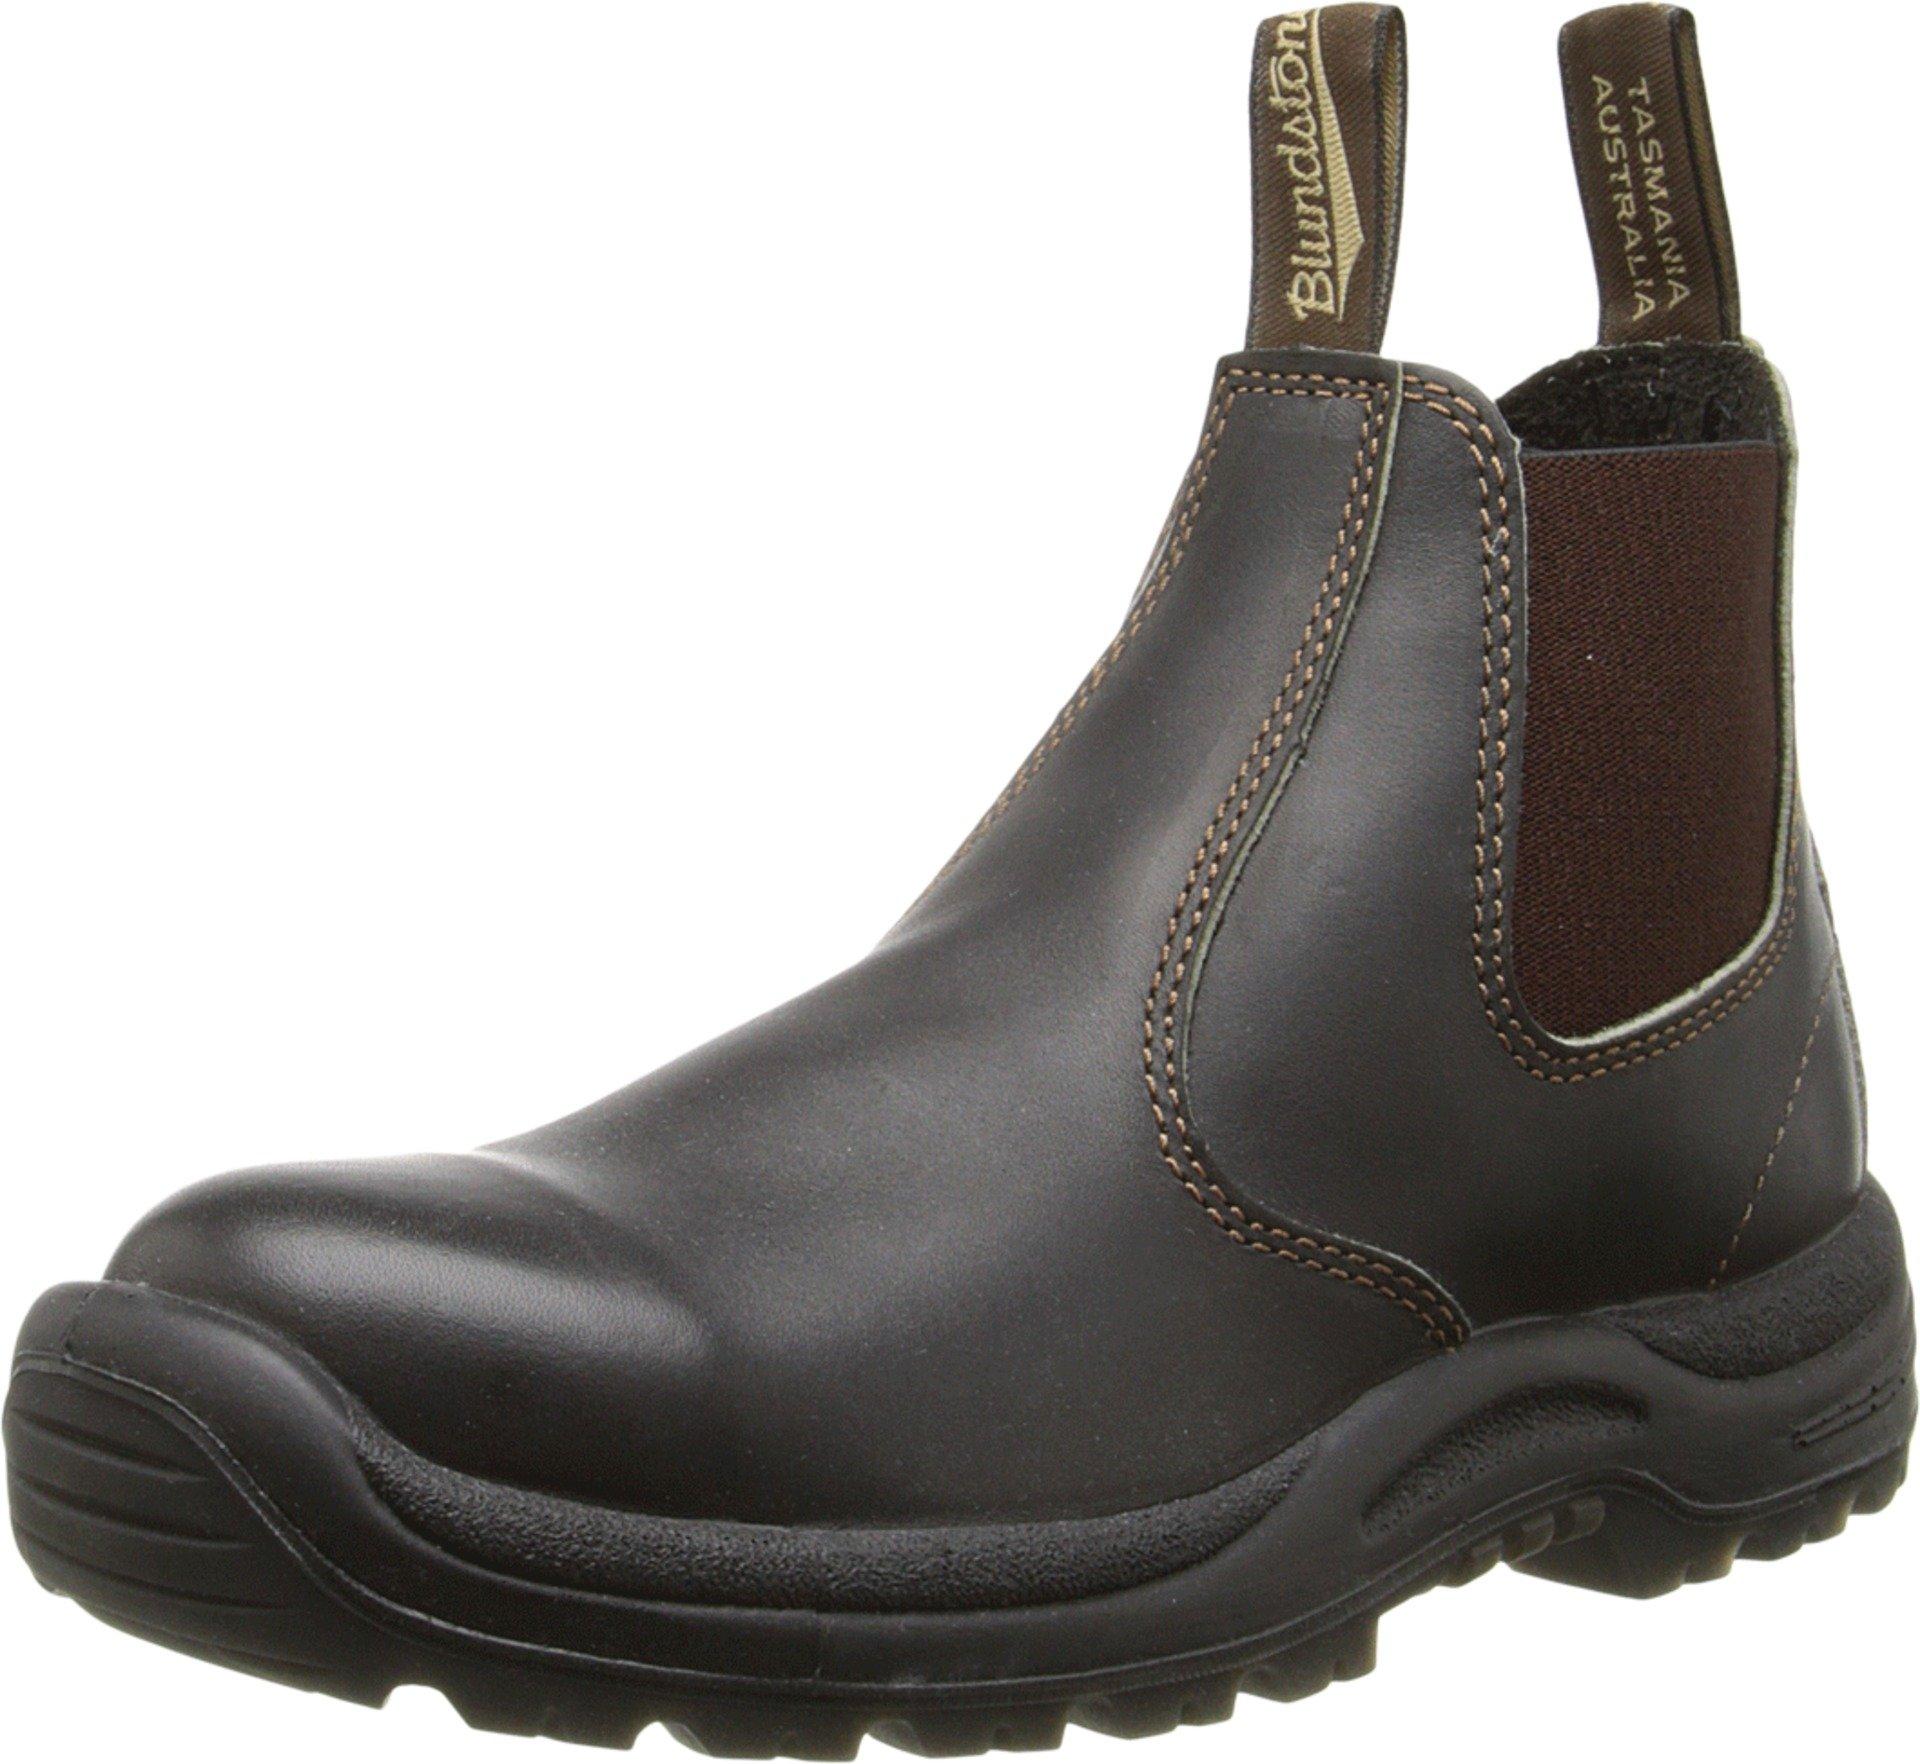 Blundstone 490 Bump-Toe Boot,Stout Brown,9.5 AU (US Women's 12 M/US Men's 10.5 M) by Blundstone